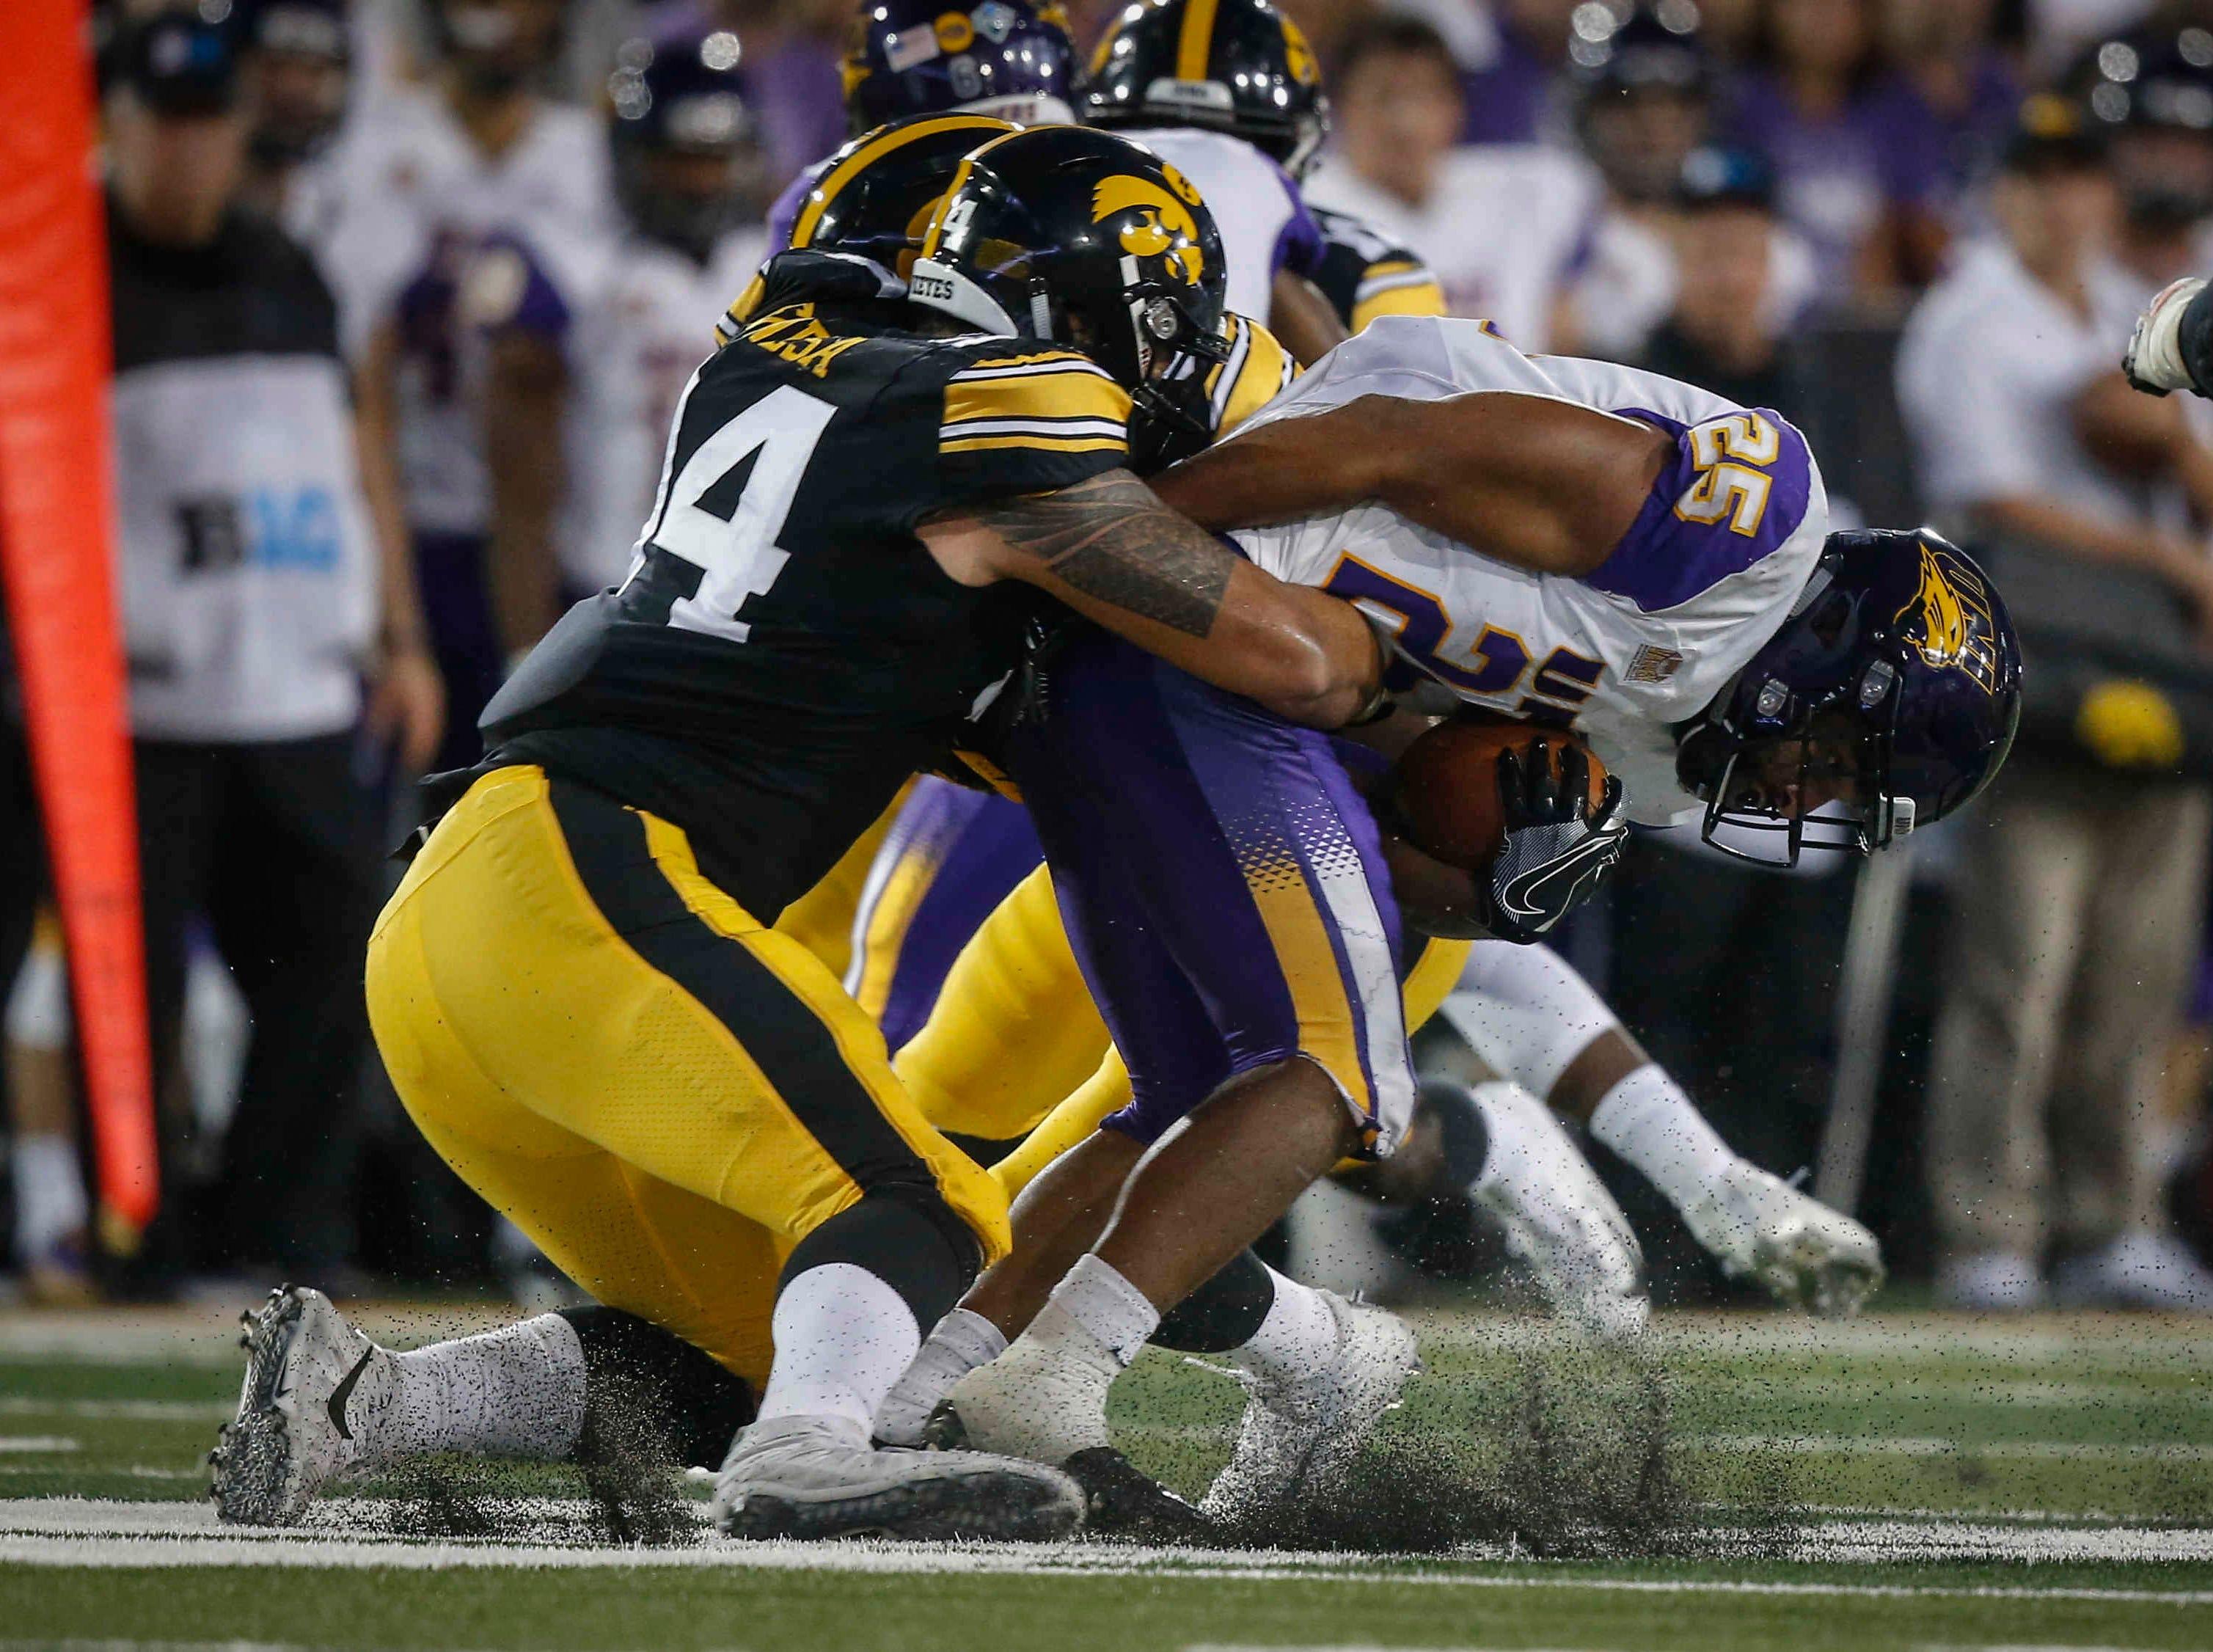 Iowa right end A.J. Epenesa tackles Northern Iowa running back Trevor Allen on Saturday, Sept. 15, 2018, at Kinnick Stadium in Iowa City.